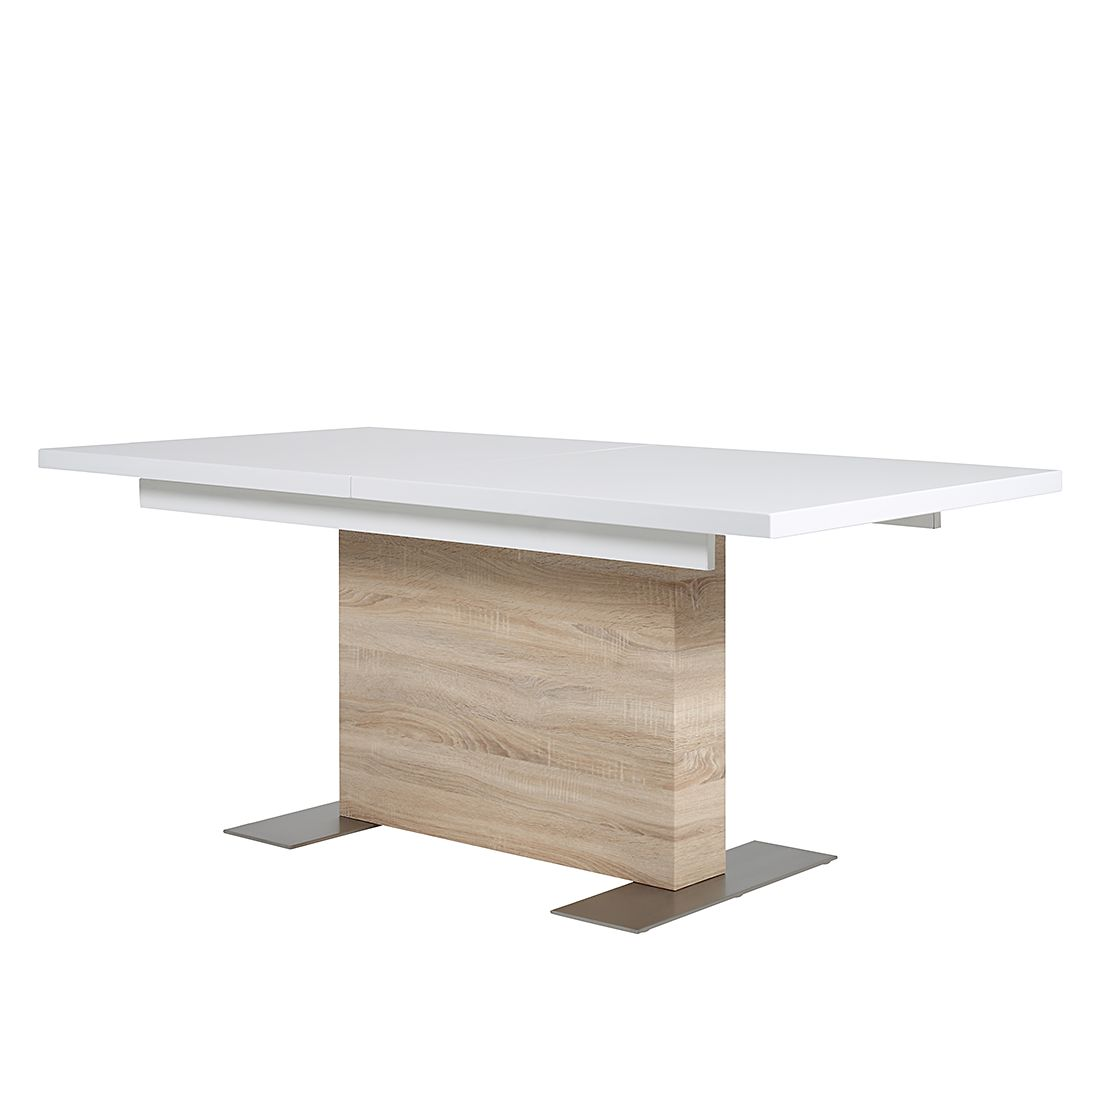 Table à manger Rick (extractible) - Blanc brillant / Imitation chêne de Sonoma, Fredriks